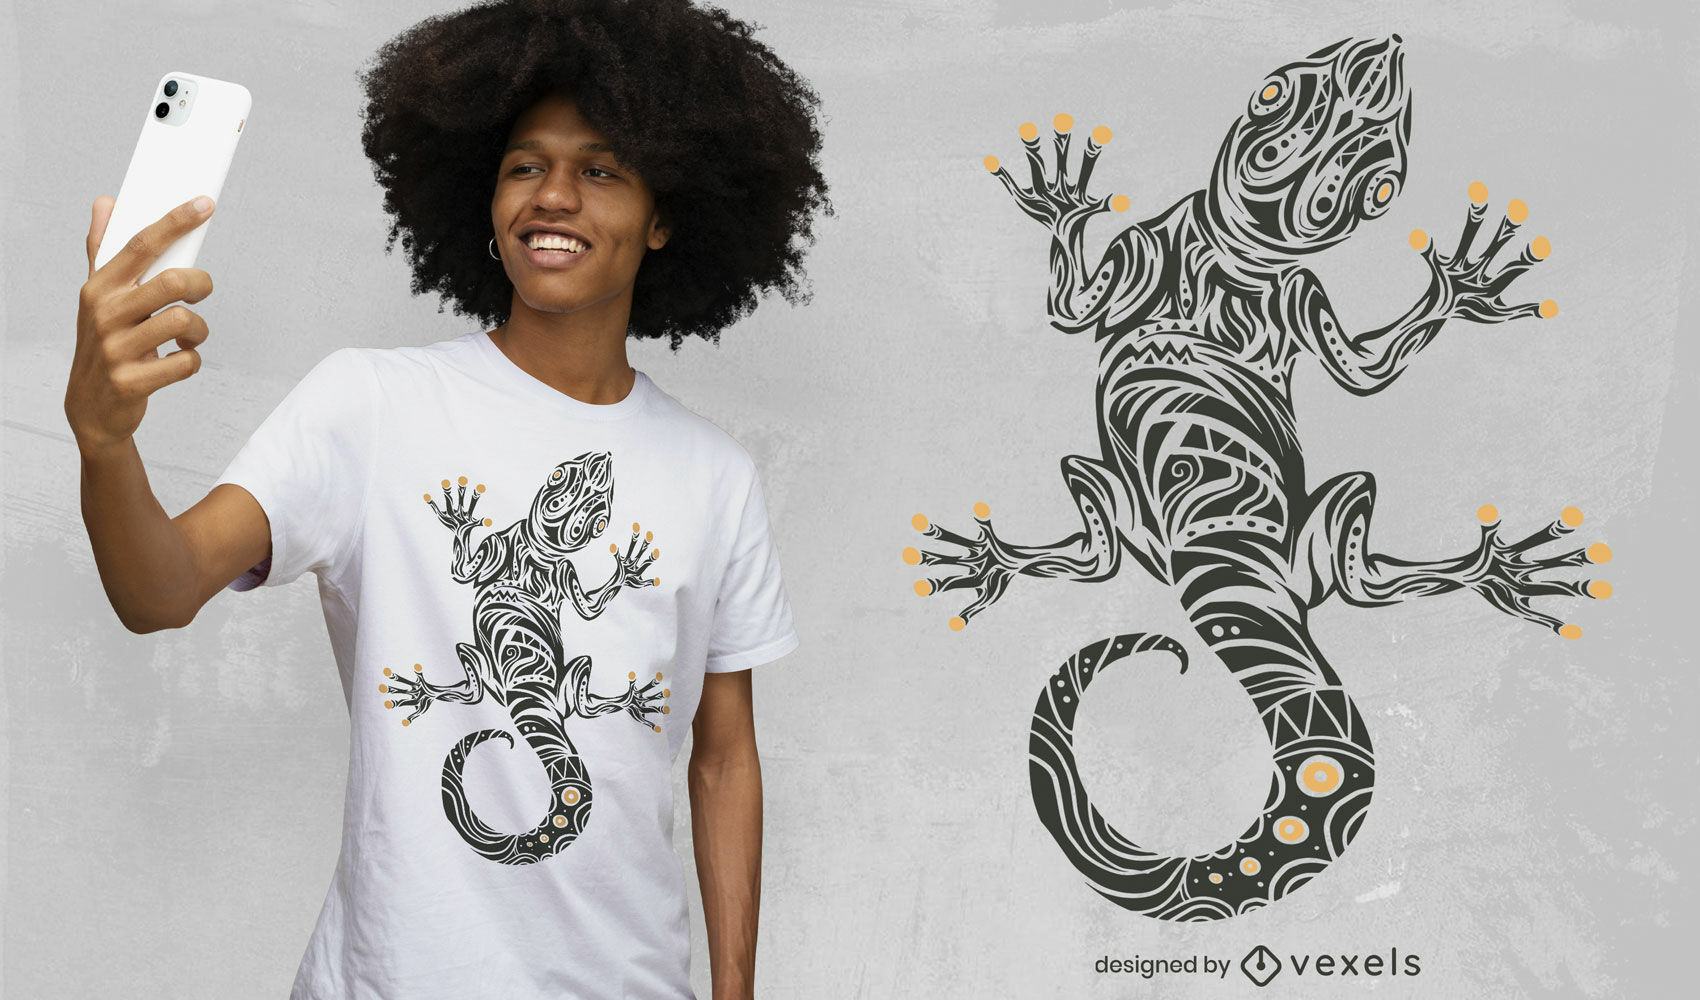 Gecko-Tier-Stammes-Kunst-T-Shirt-Design